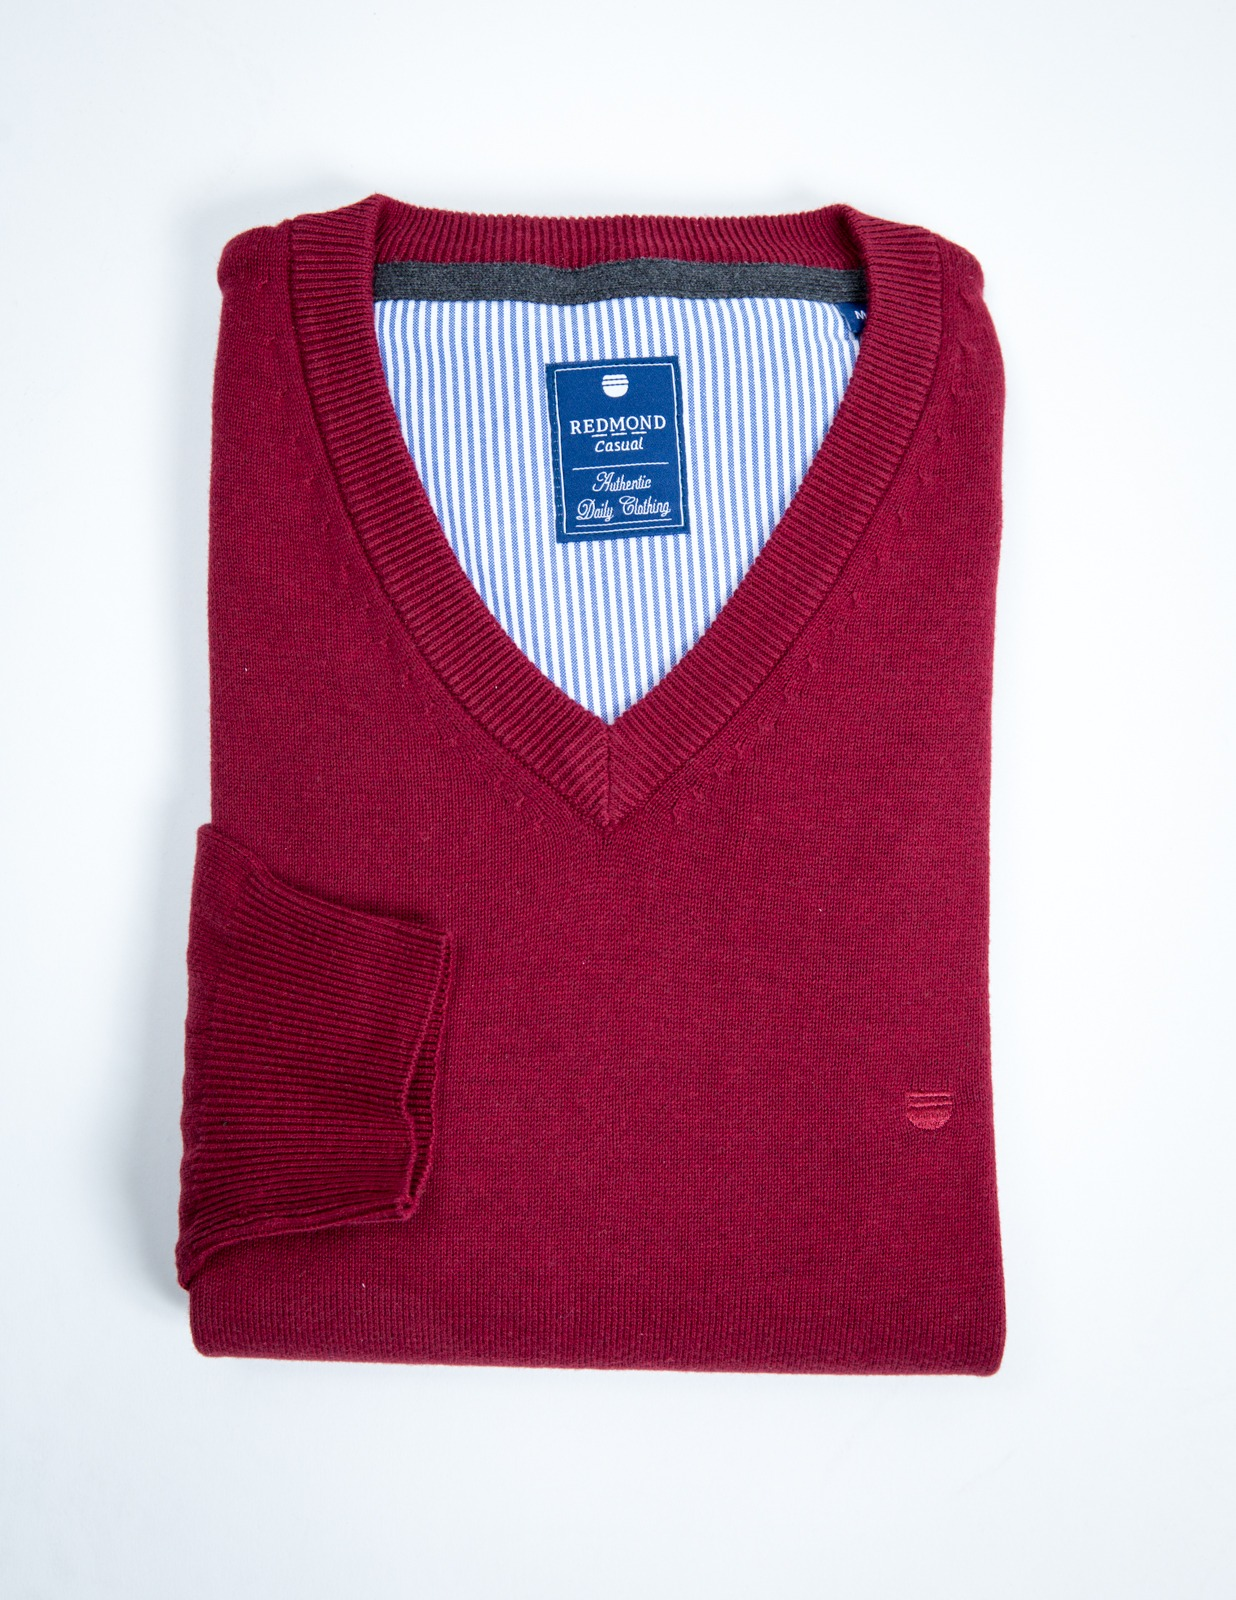 125401a27252 Μπλούζα Redmond 600RMOND - AlterEgo